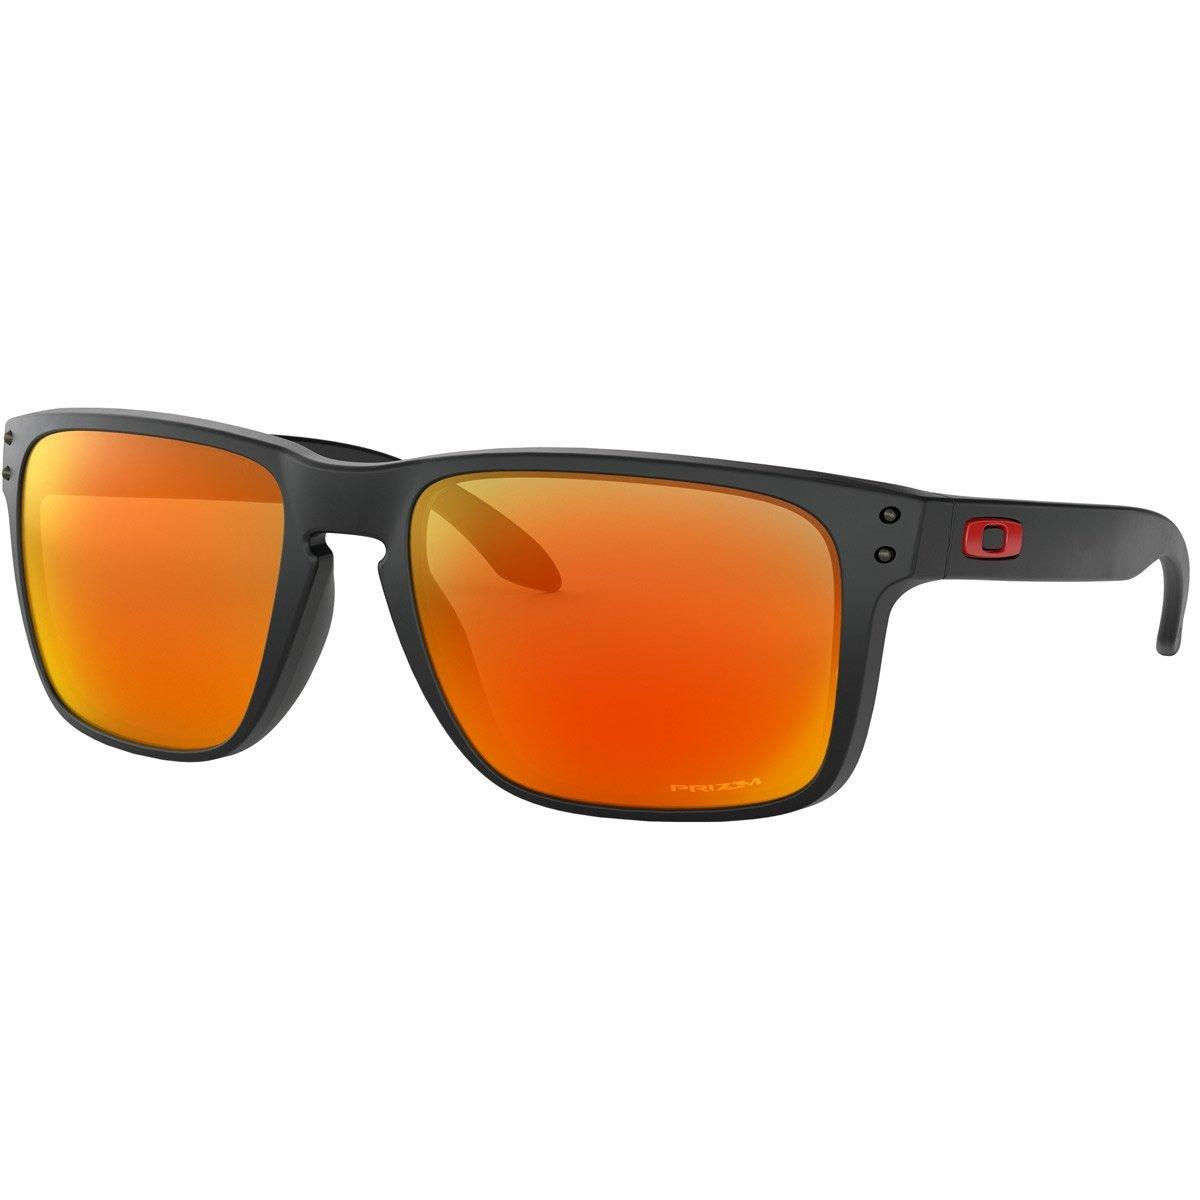 275176b9c3310 Óculos Oakley Holbrook Xl Prizm Ruby - Compre Agora